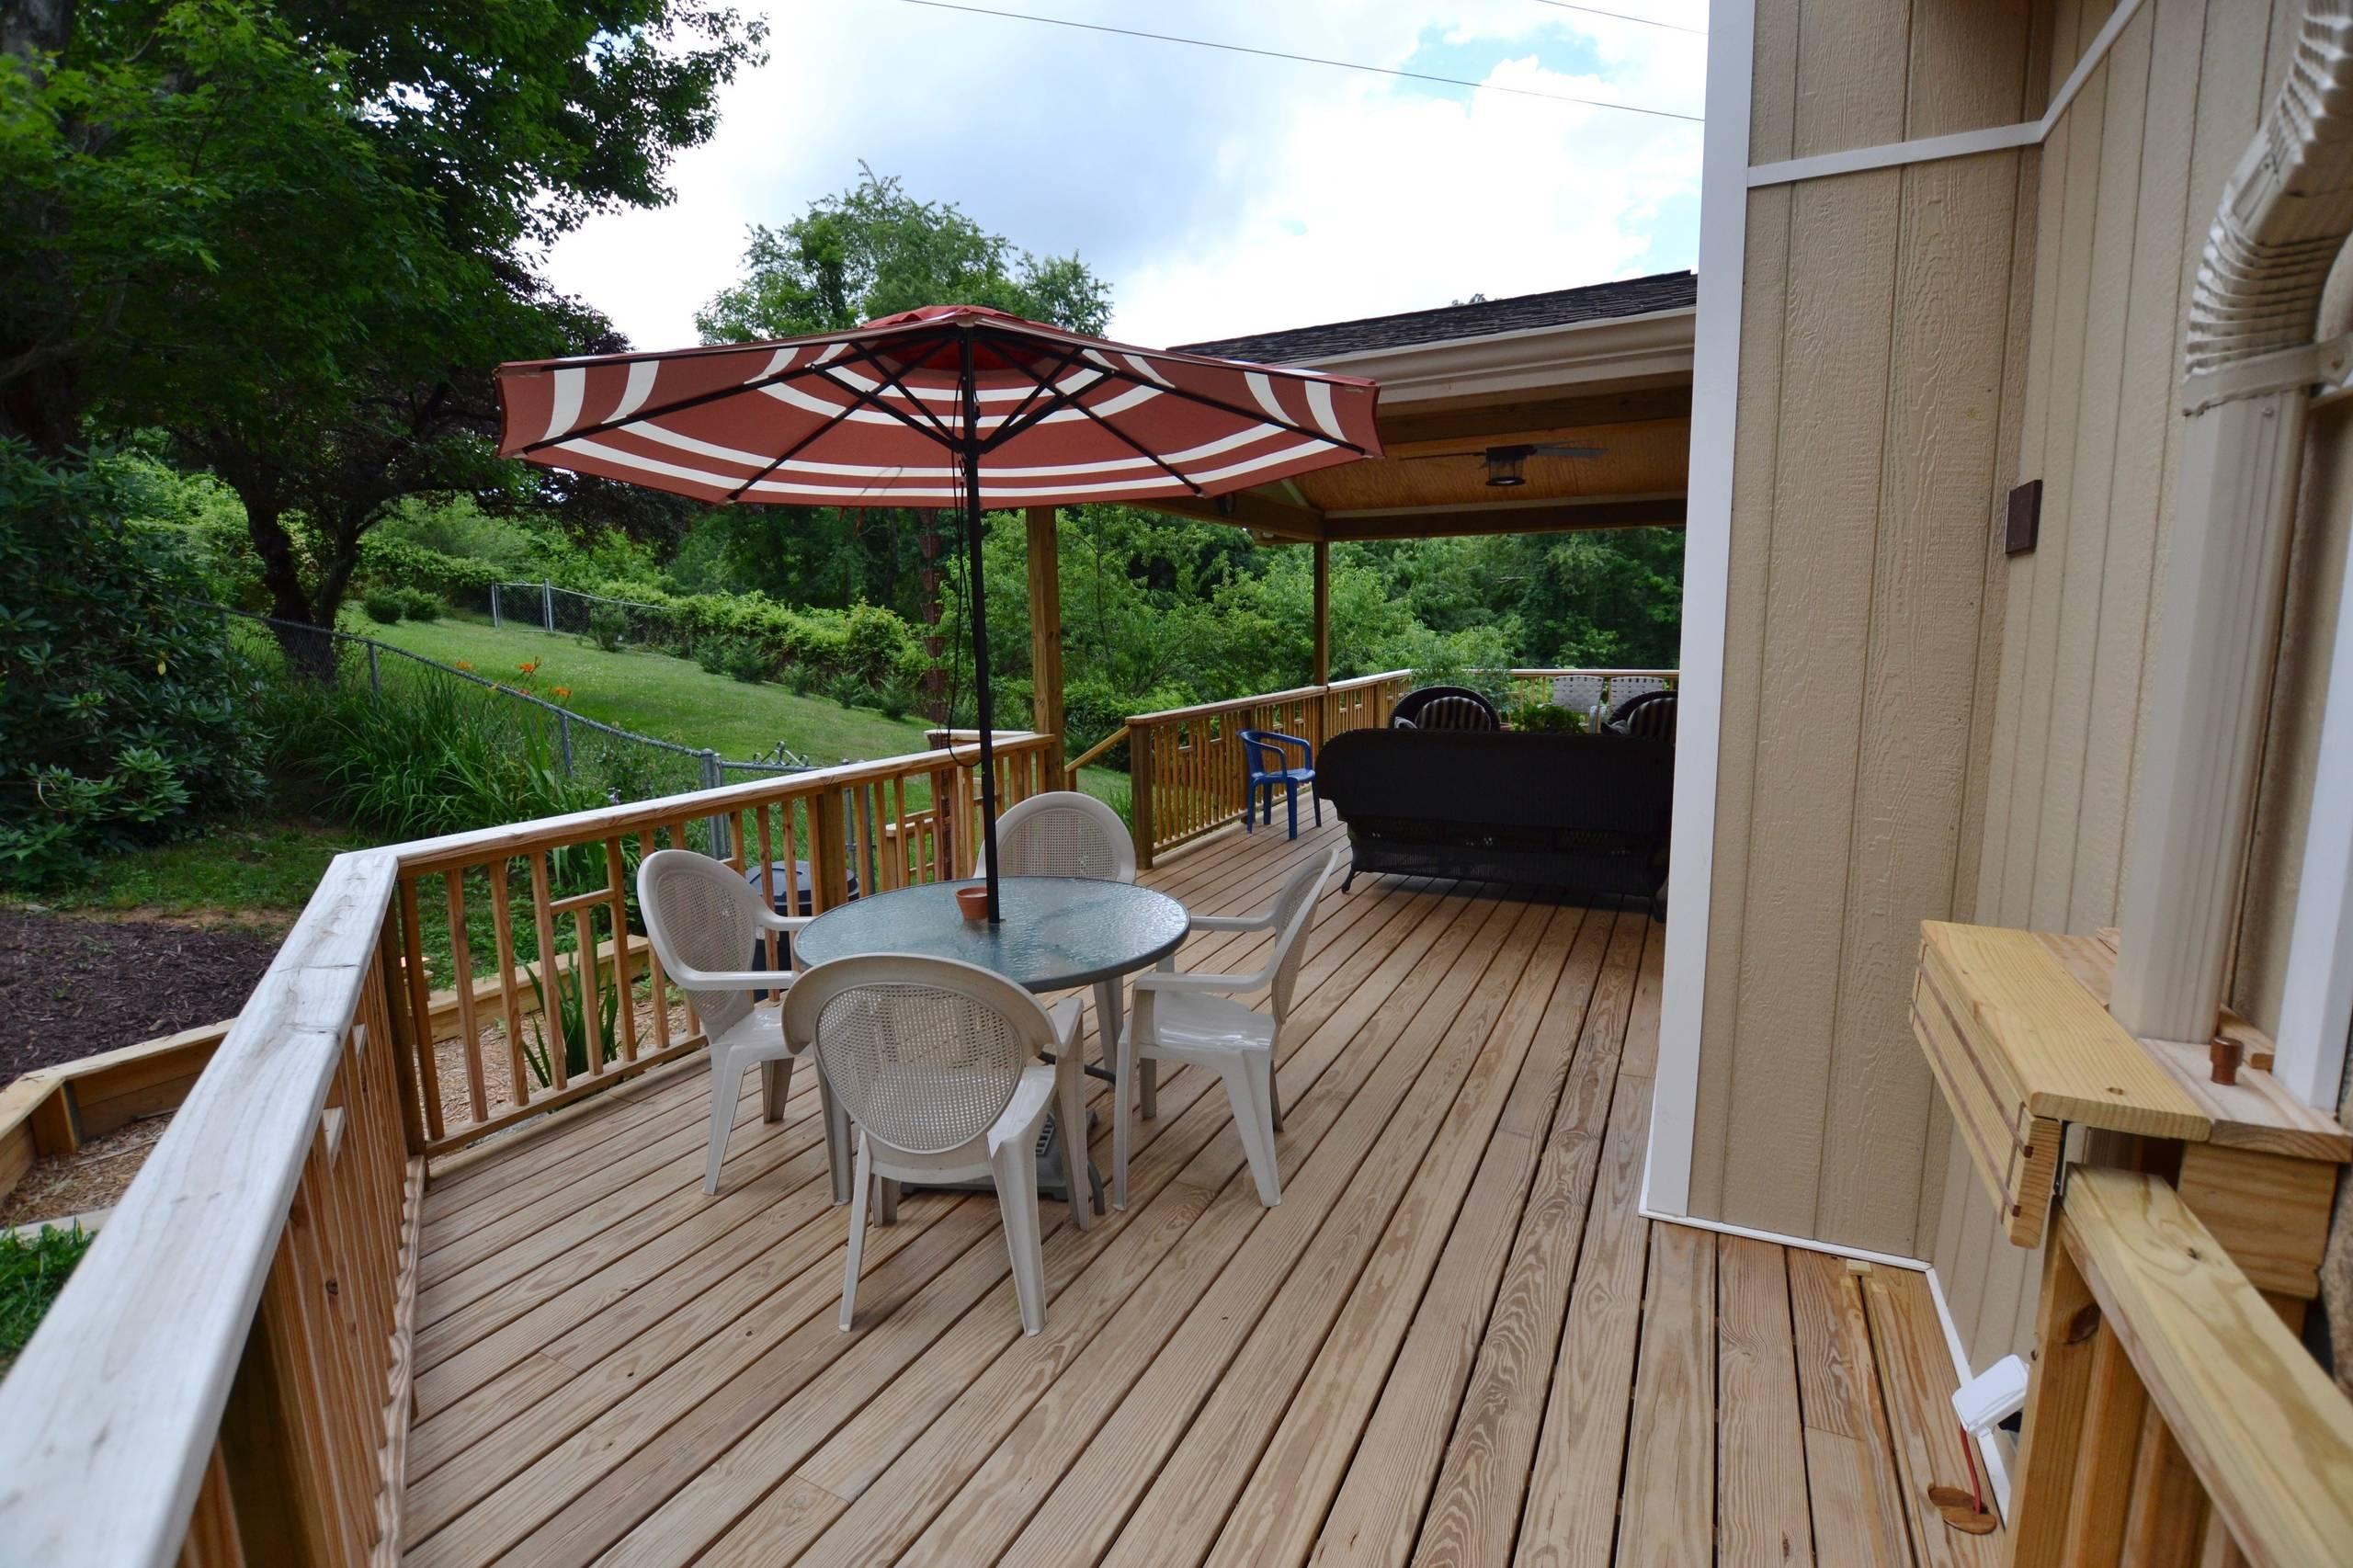 New Deck & Exterior